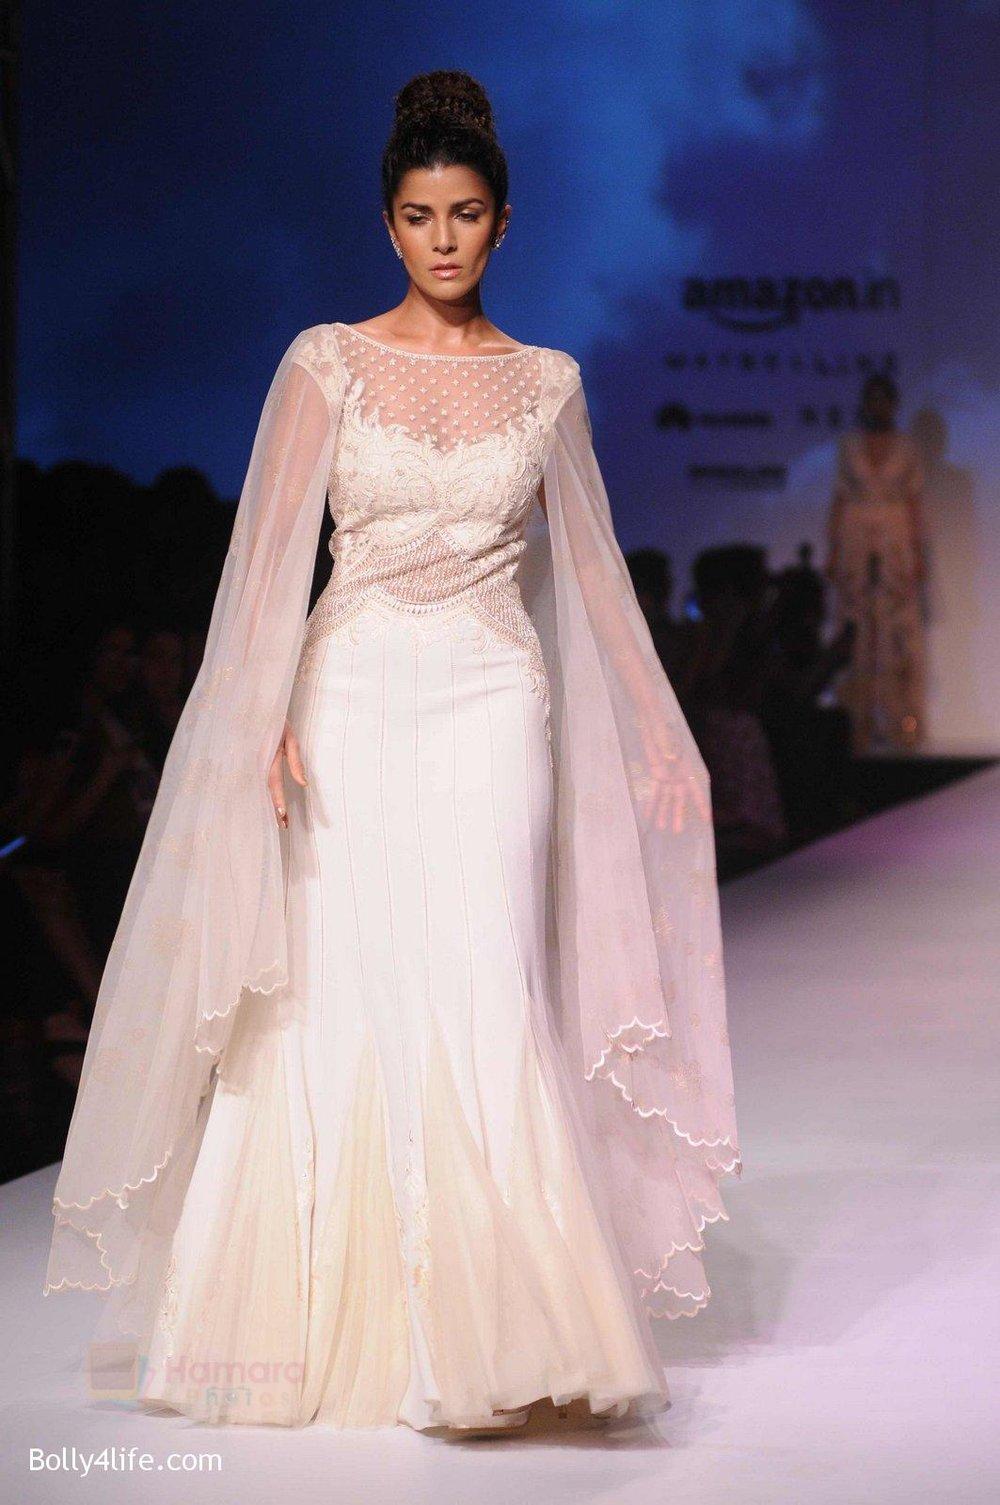 Nimrat-Kaur-walk-the-ramp-for-Mandira-Wrik_s-show-at-Amazon-India-Fashion-Week-on-15th-Oct-2016-45.jpg